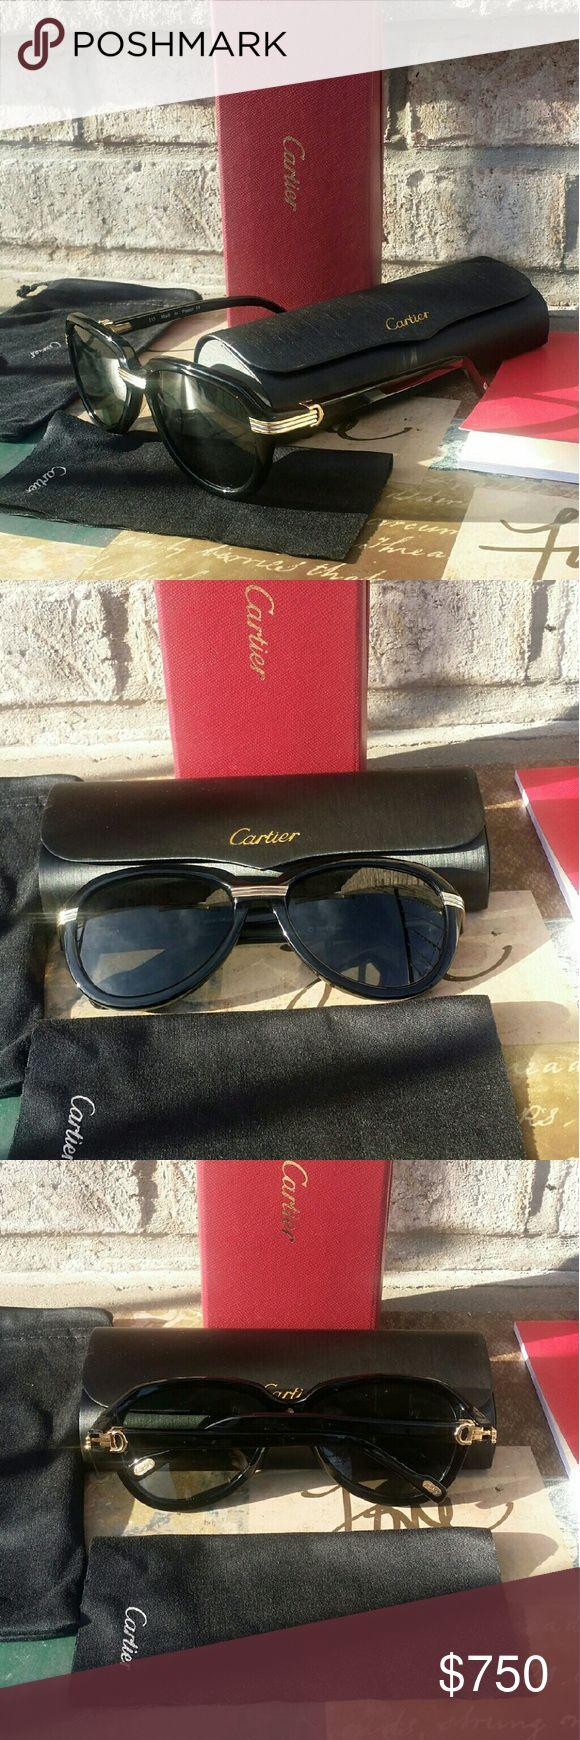 Cartier Unisex  Luxury Sunglasses Cartier Unisex  Luxury Sunglasses Cartier Accessories Glasses